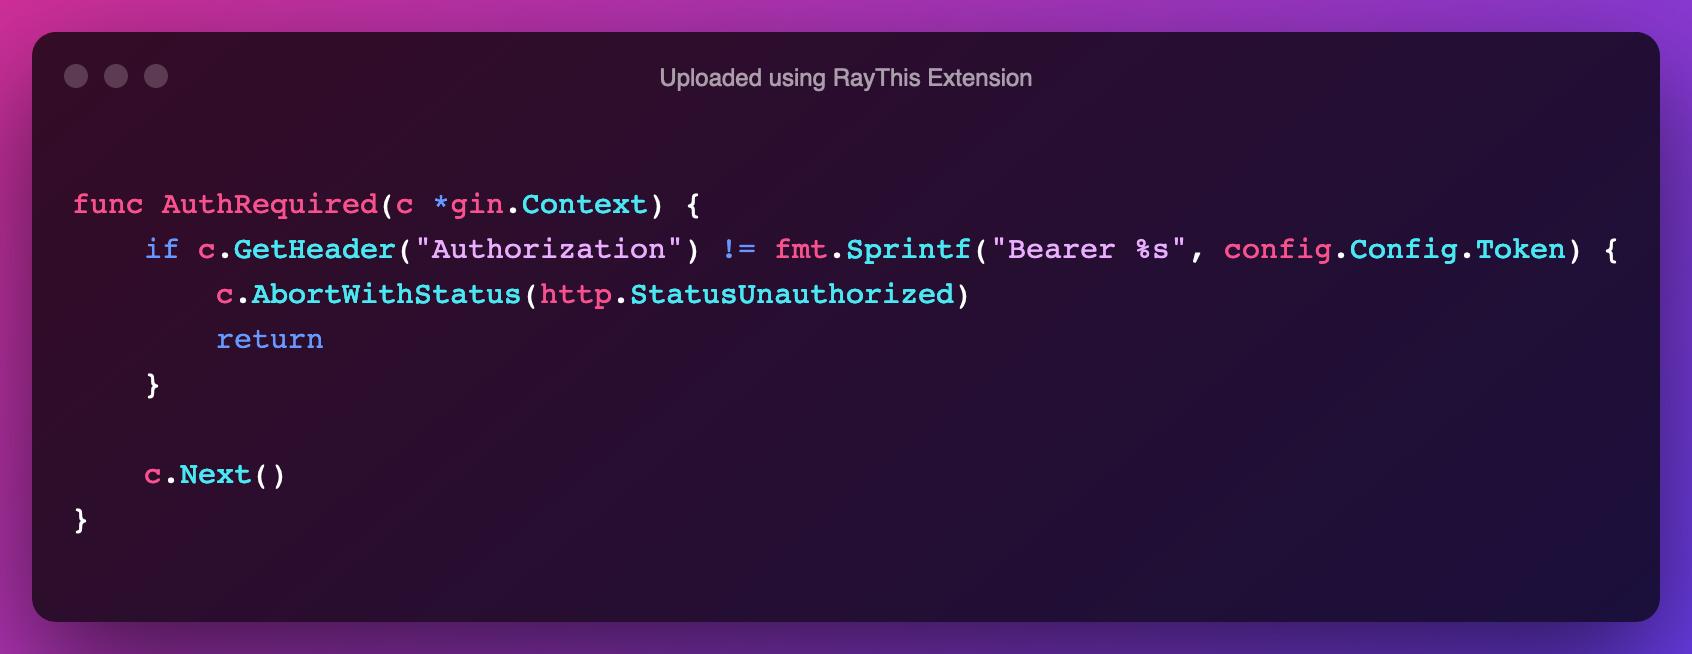 https://cloud-dod4evxg6-hack-club-bot.vercel.app/0uploaded_using_raythis_extension_1_.png